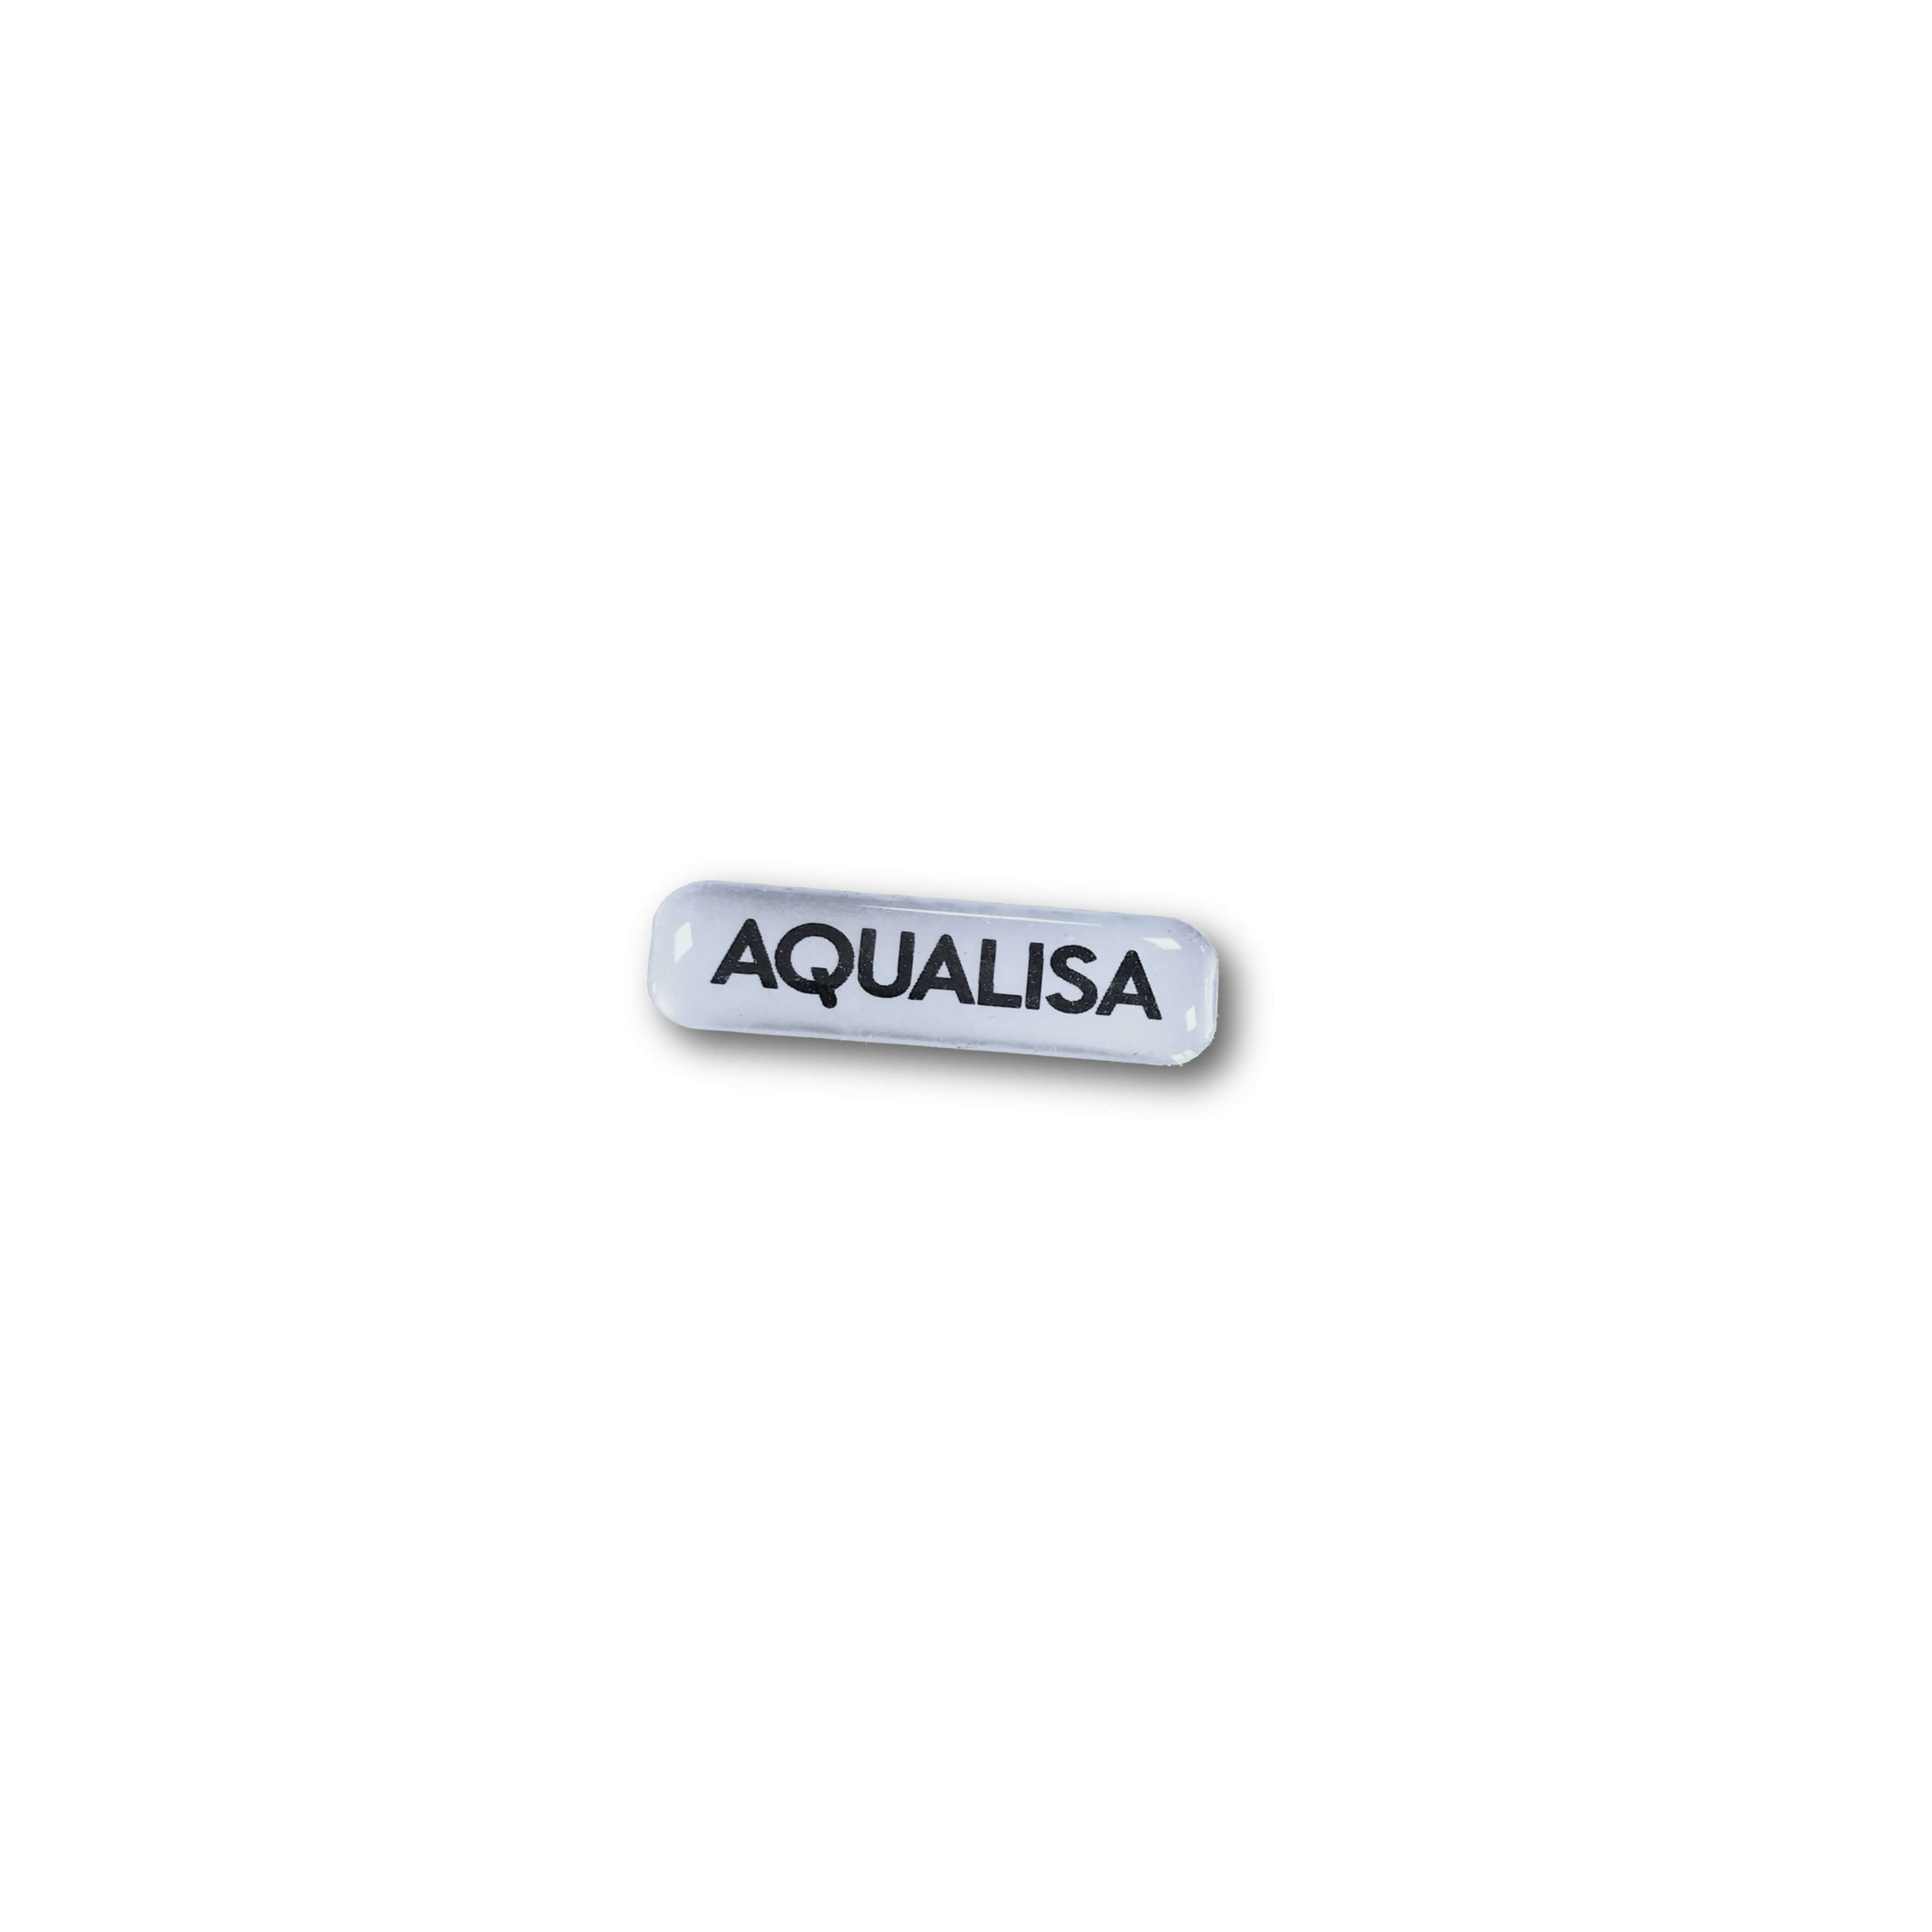 Aqualisa 164361 Badge